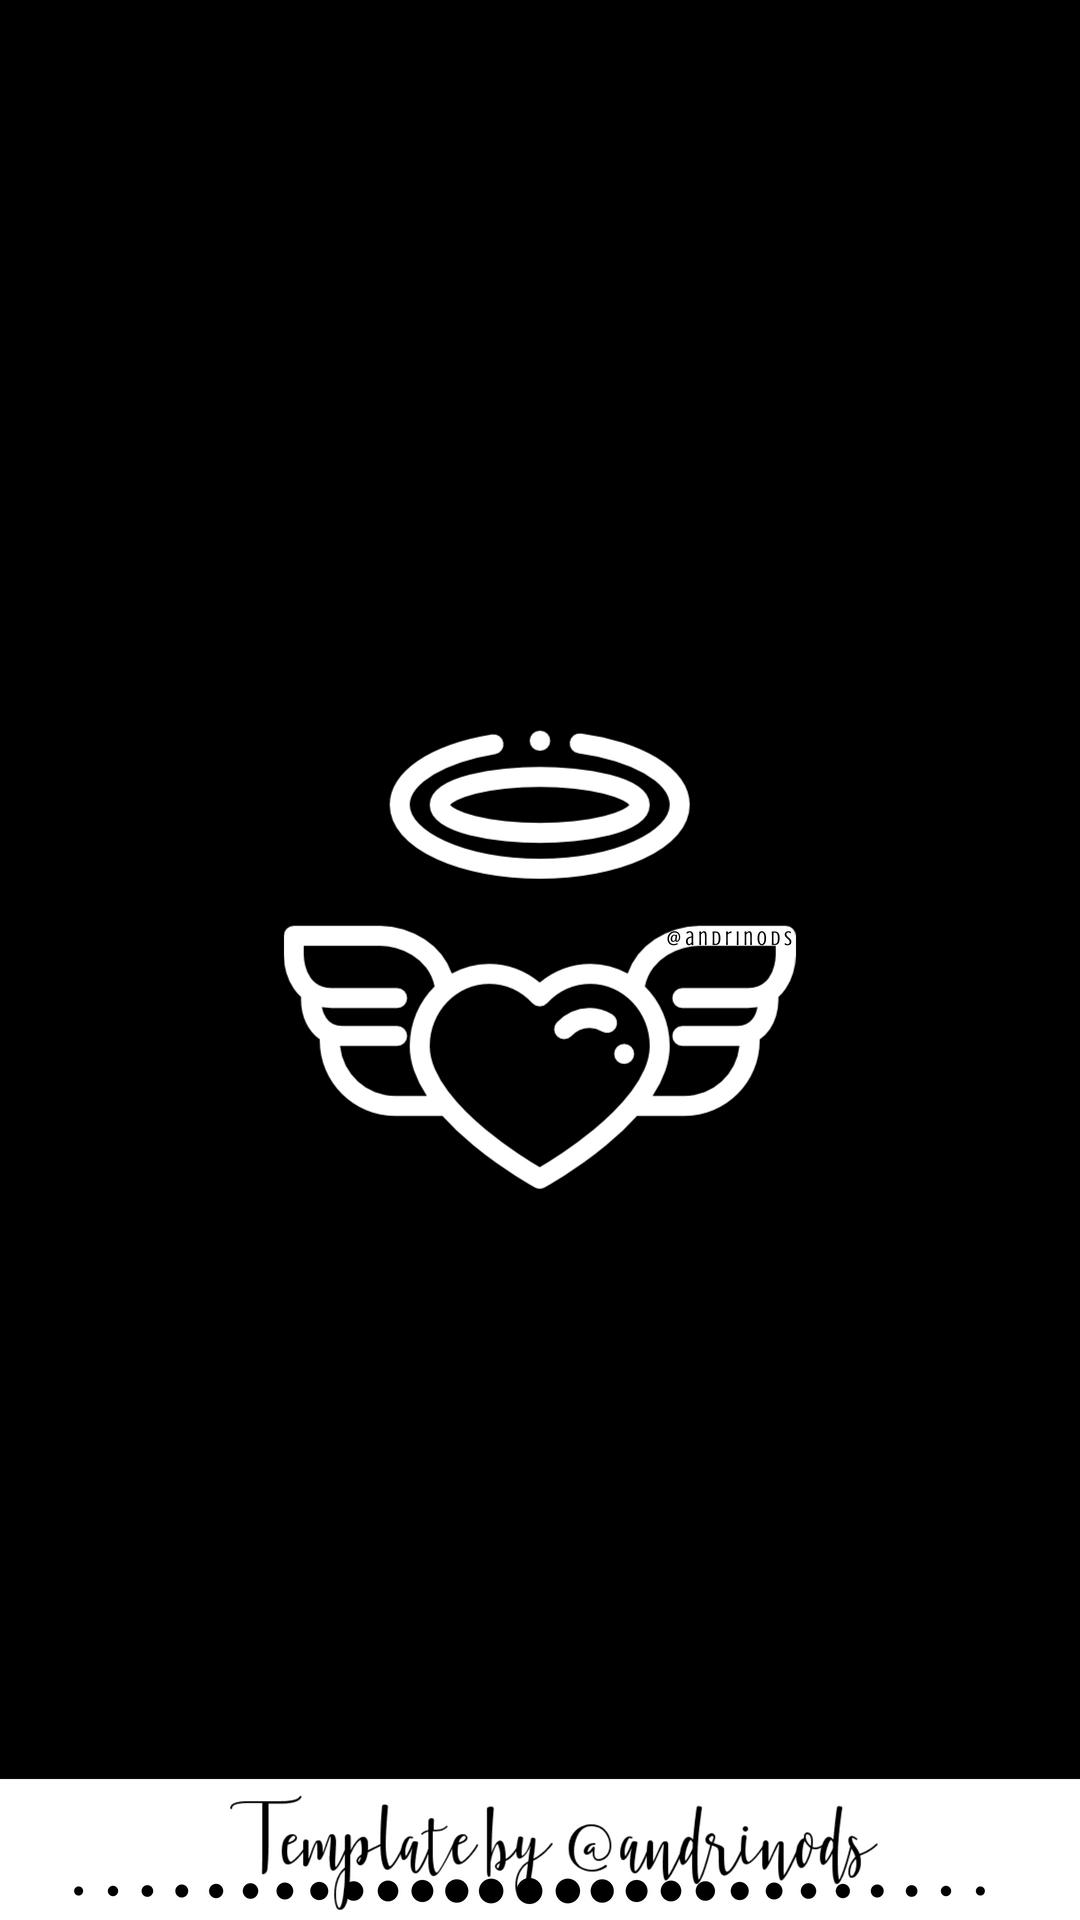 Black Anchor Wallpaper in 2020 Black and white instagram